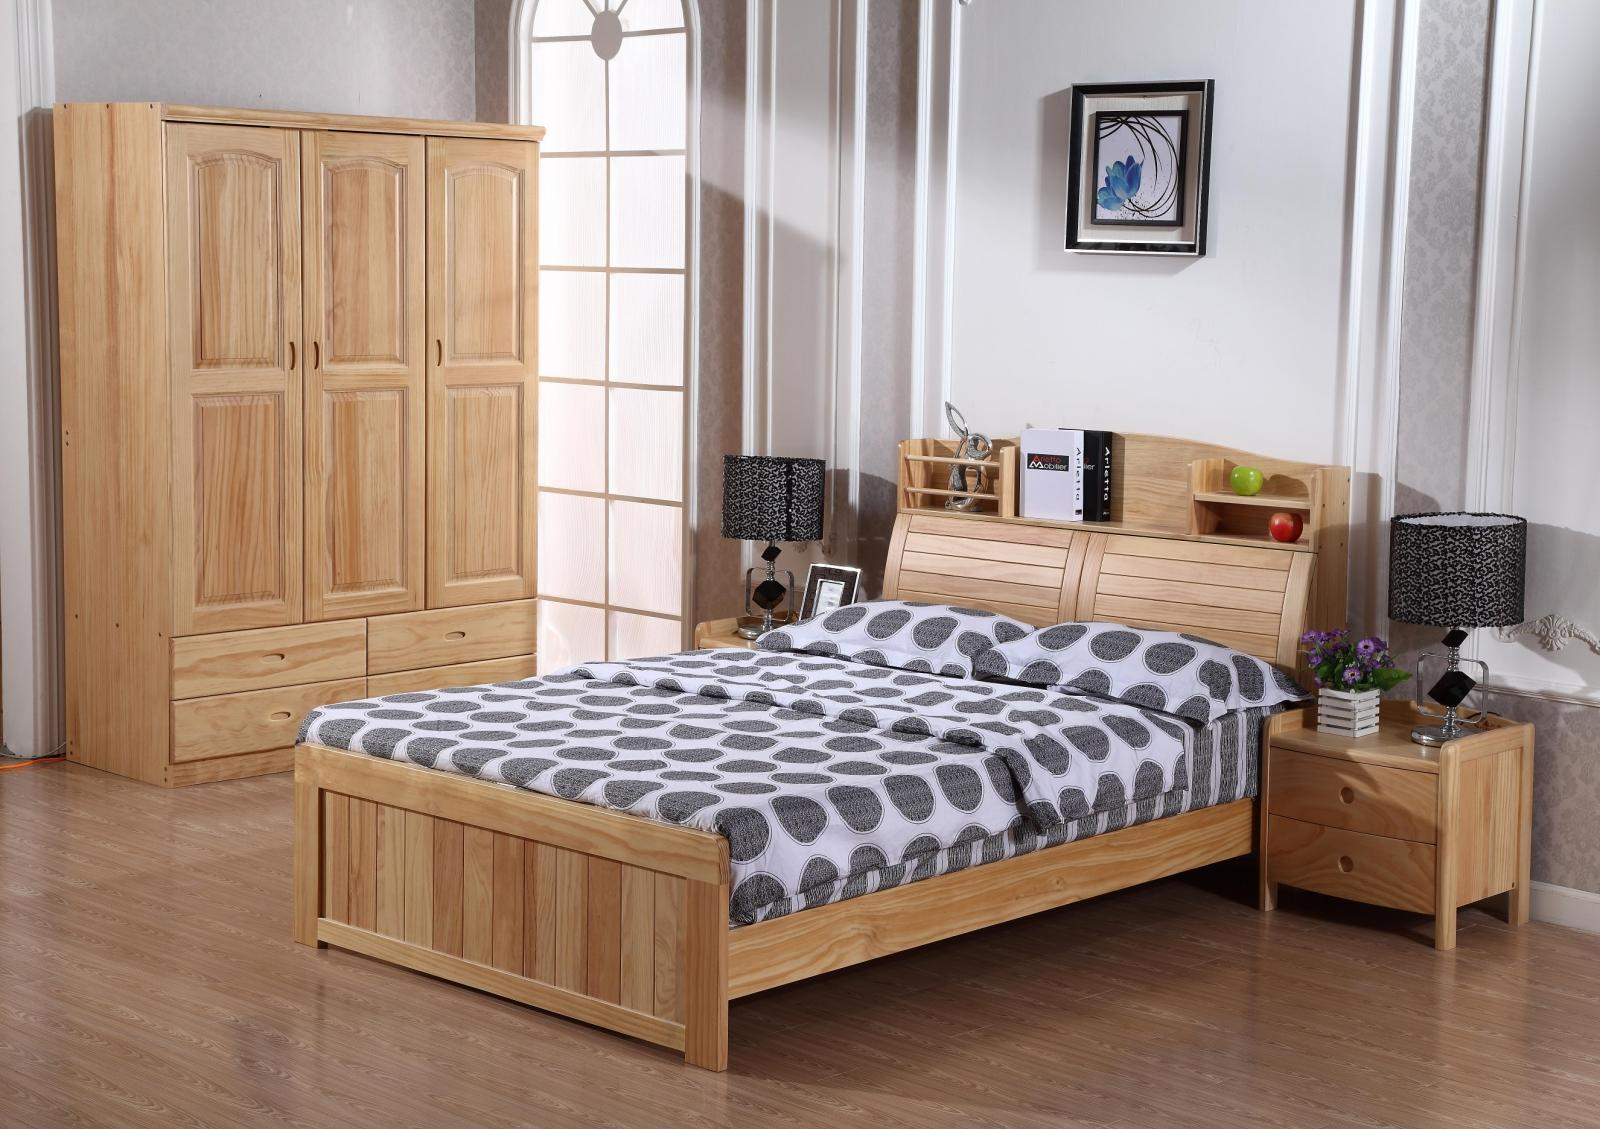 Medium Crop Of Solid Wood Bedroom Furniture